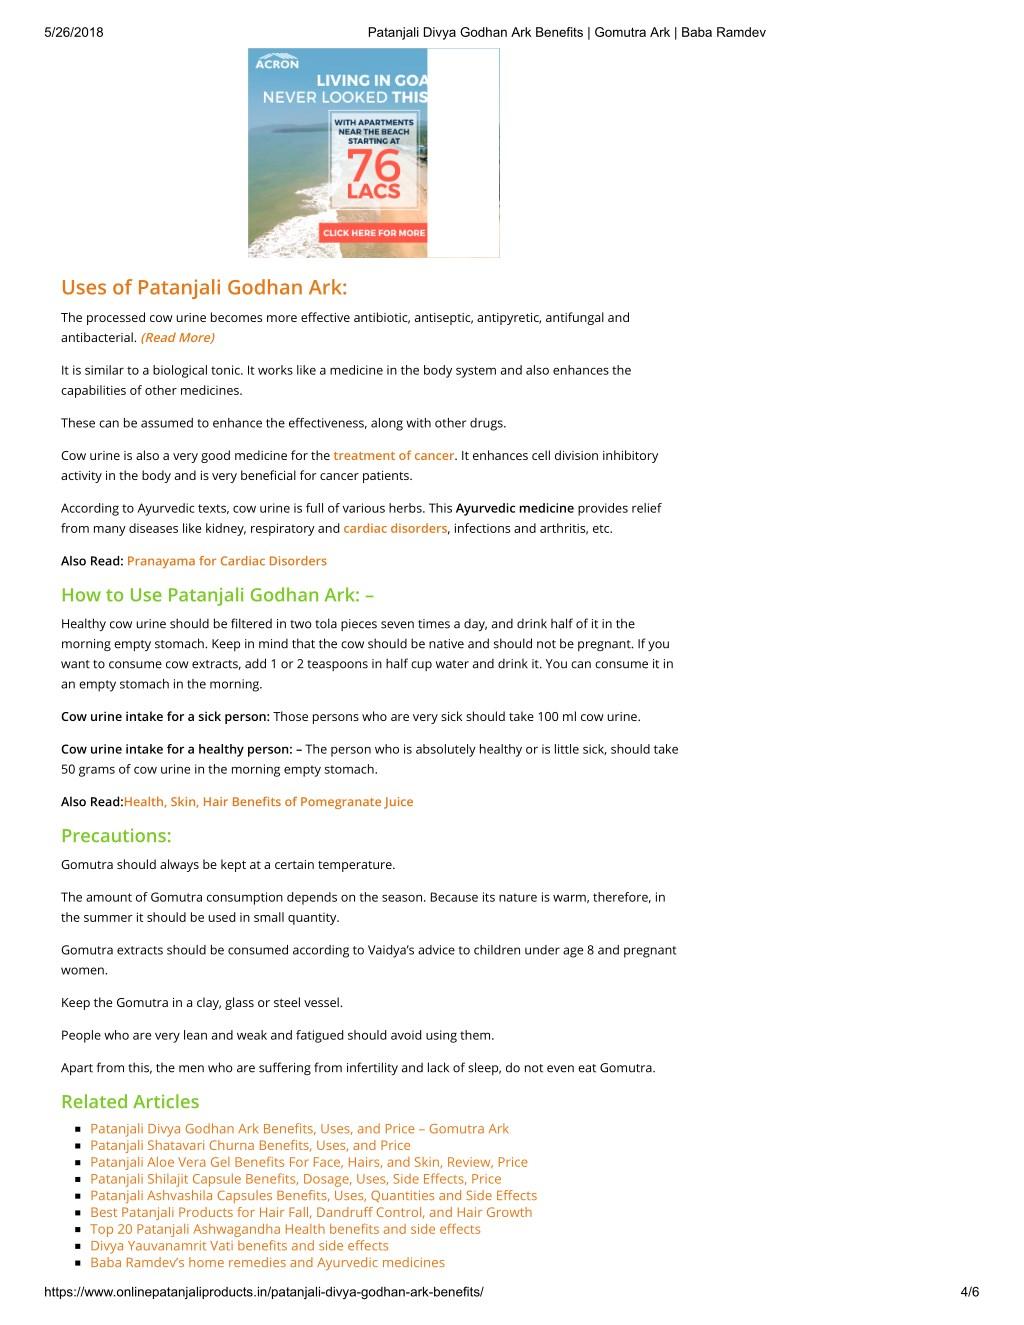 PPT - Patanjali Divya Godhan Ark Benefits PowerPoint Presentation